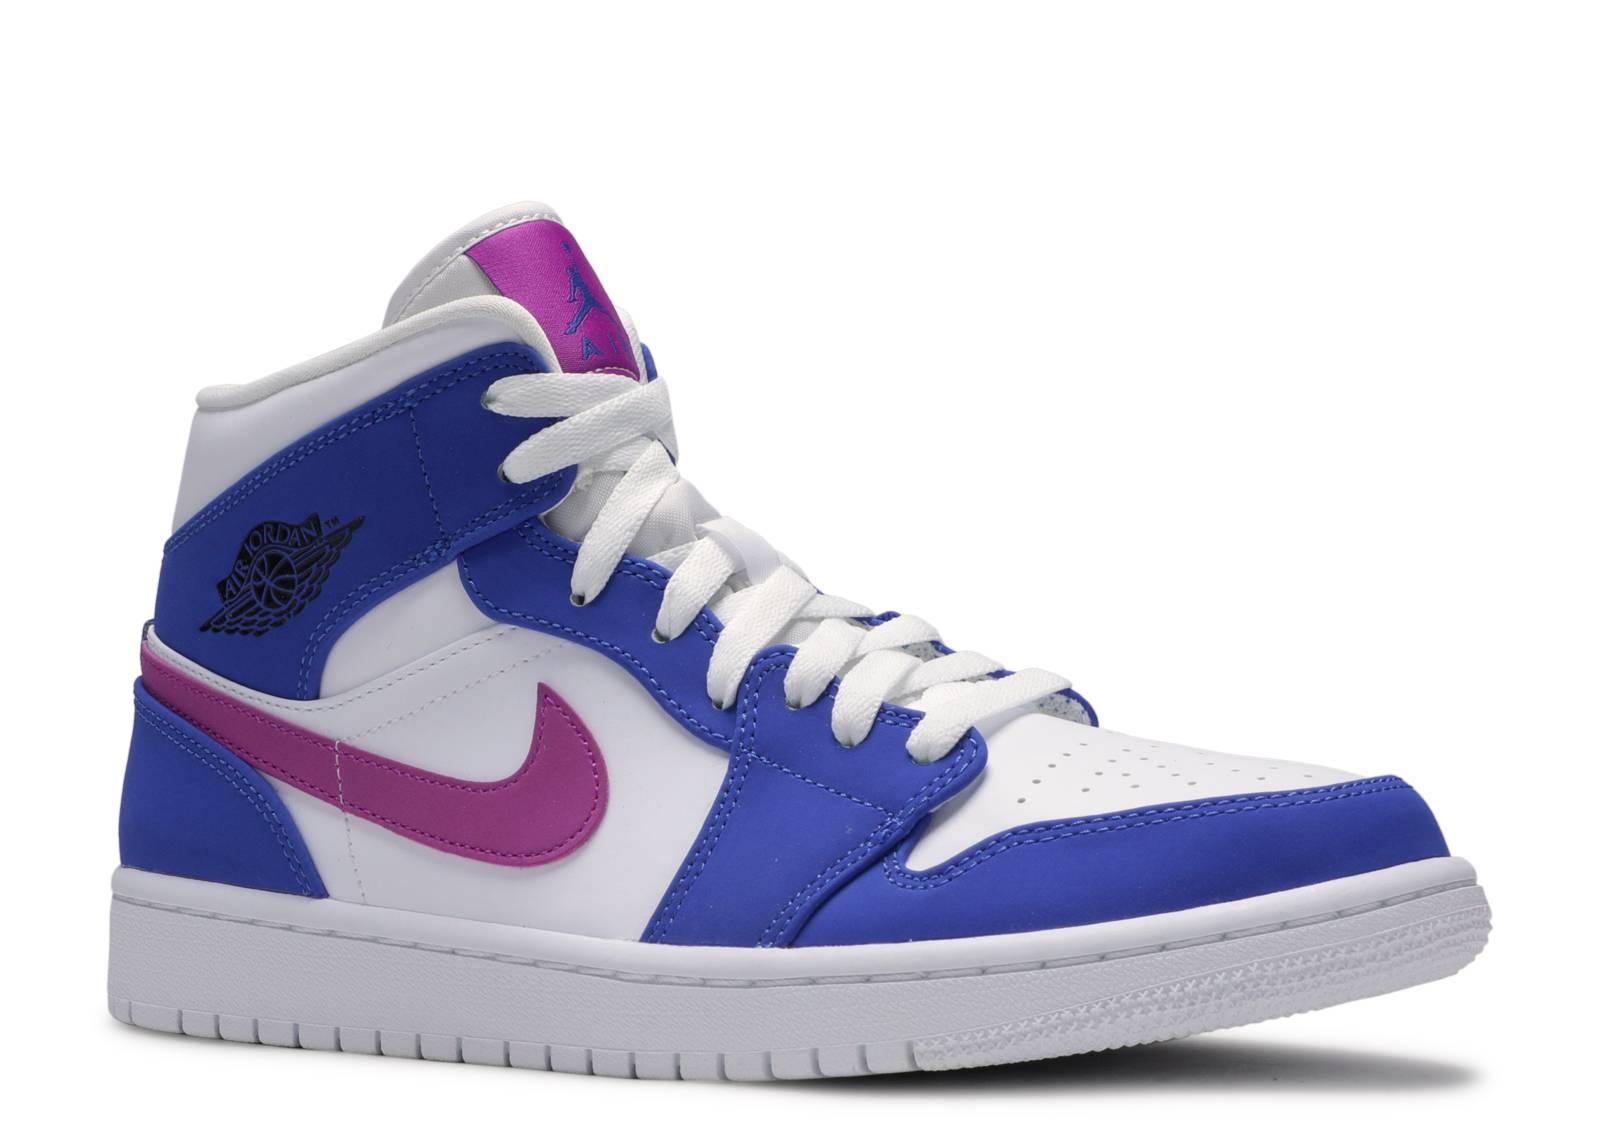 Air Jordan 1 Mid 'Royal Violet'